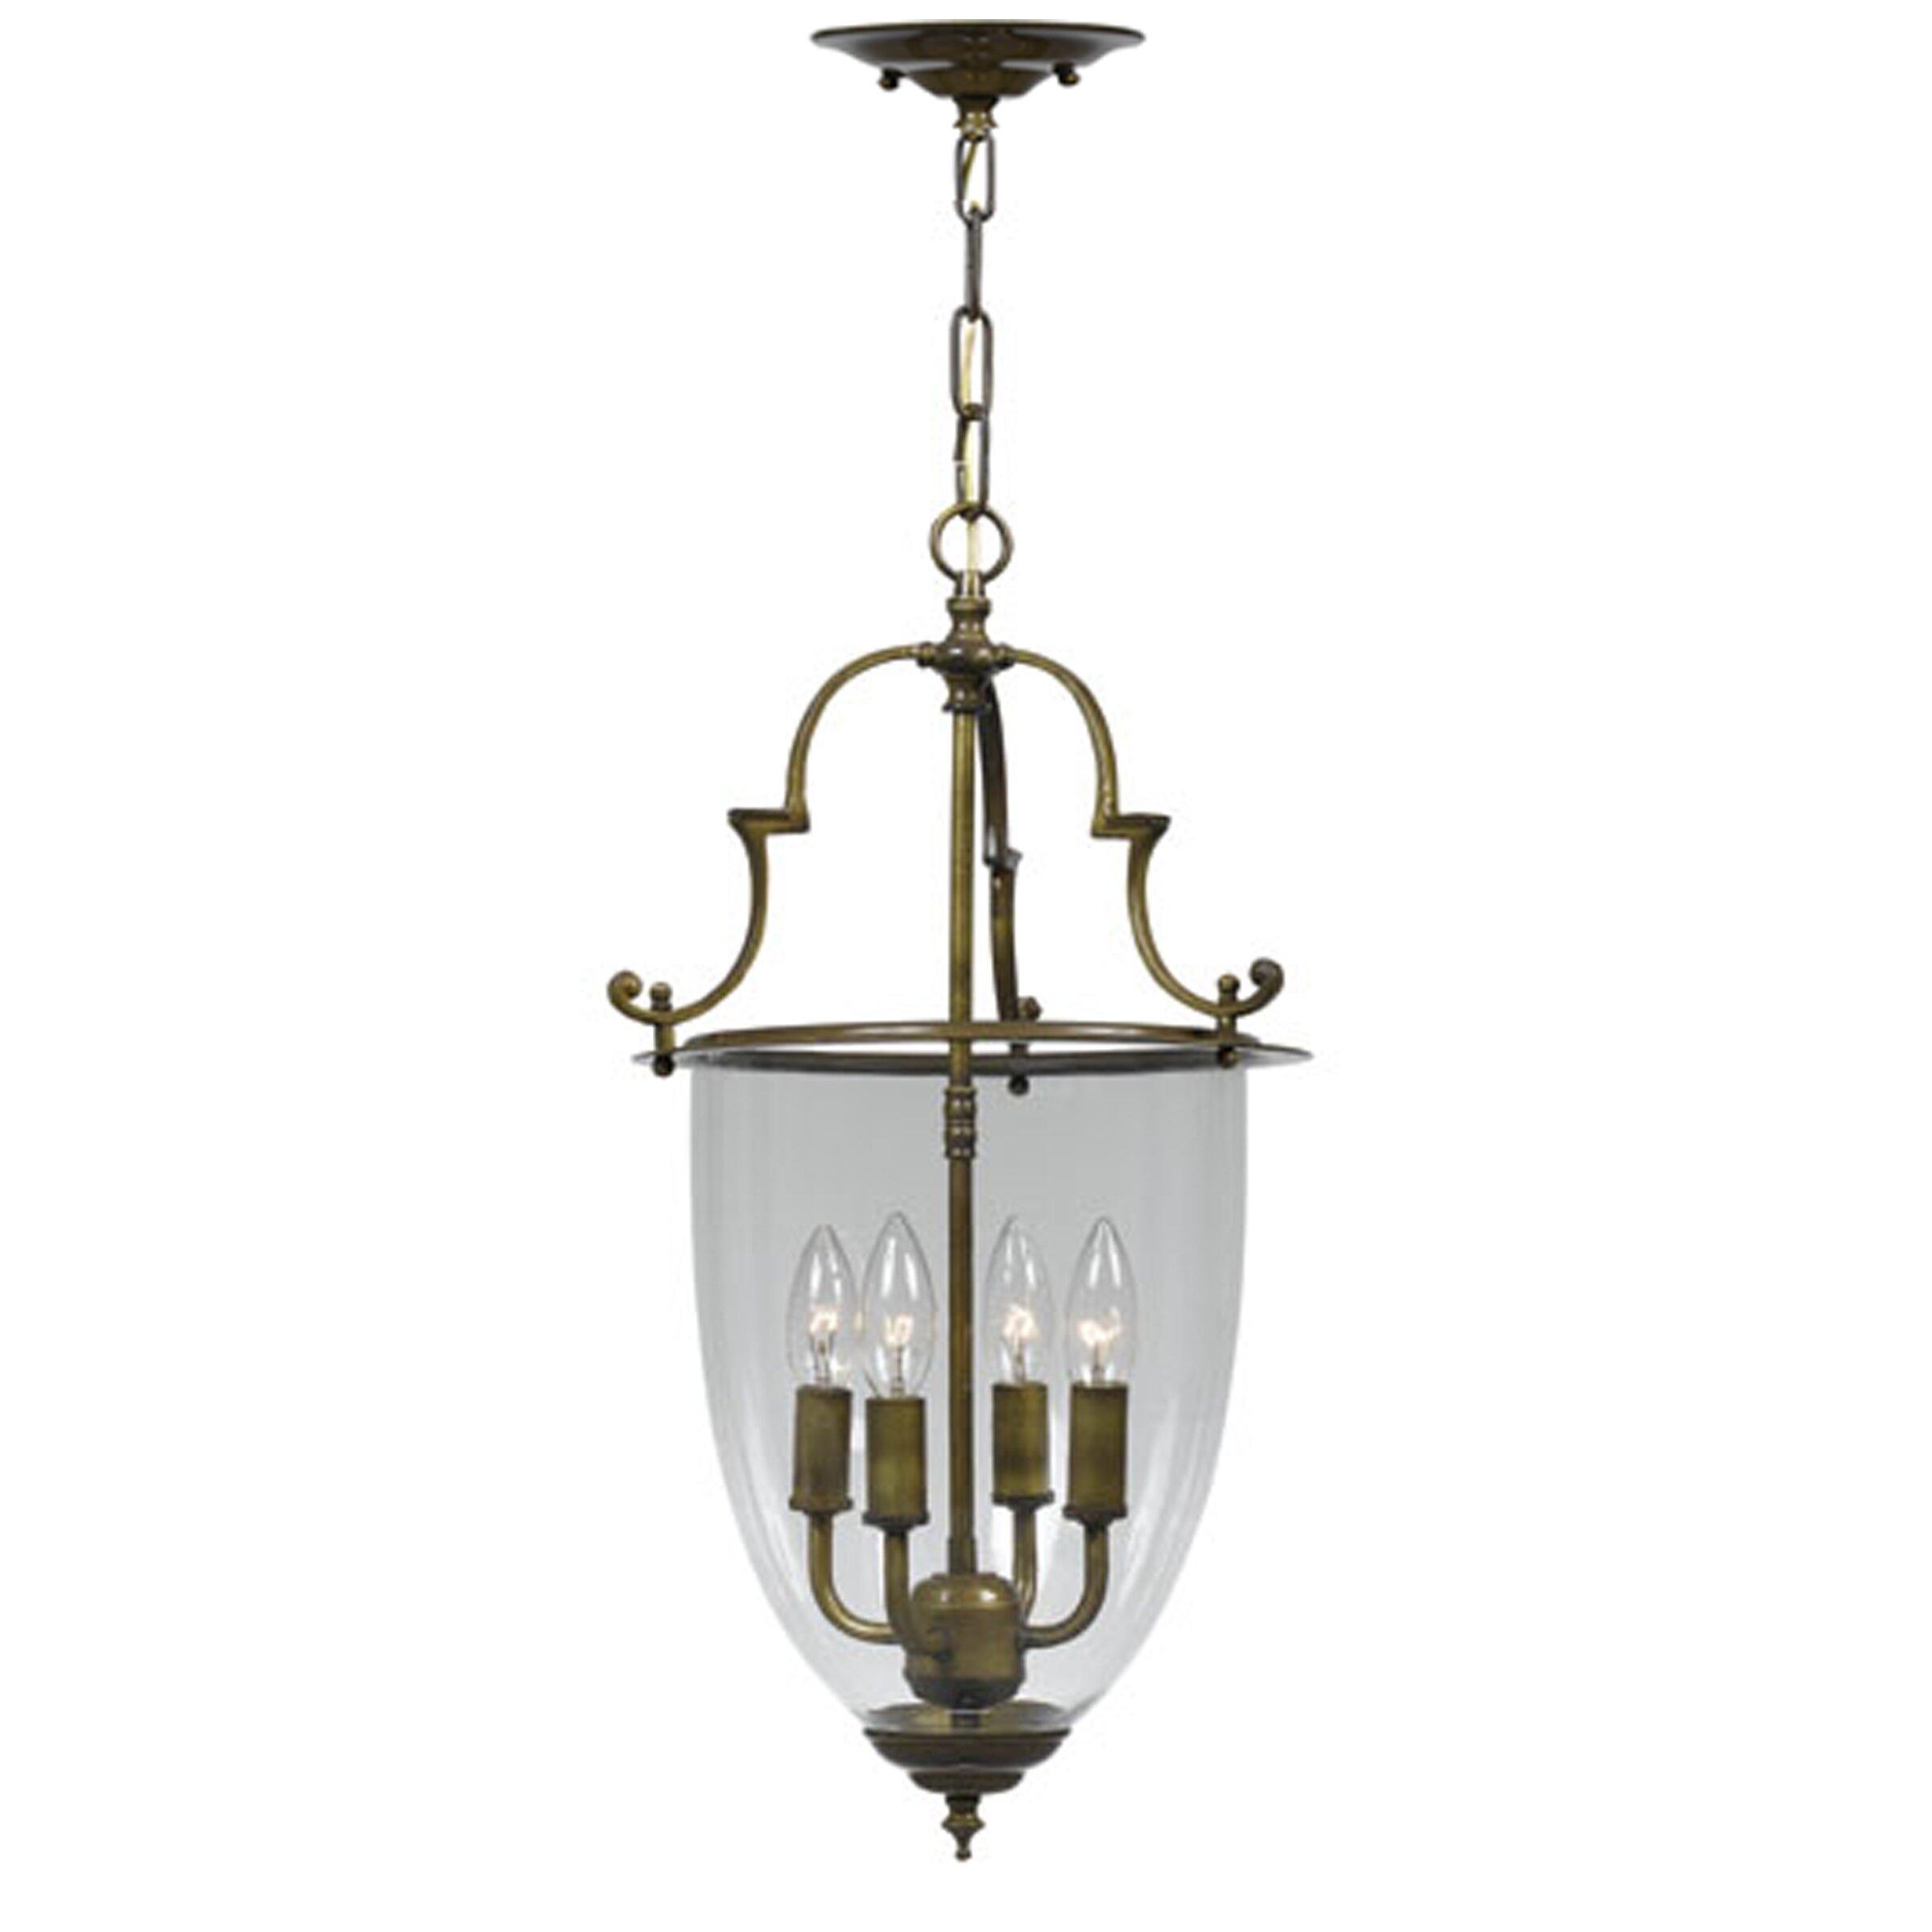 bell jar 4 light hanging foyer pendant by crystorama. Black Bedroom Furniture Sets. Home Design Ideas